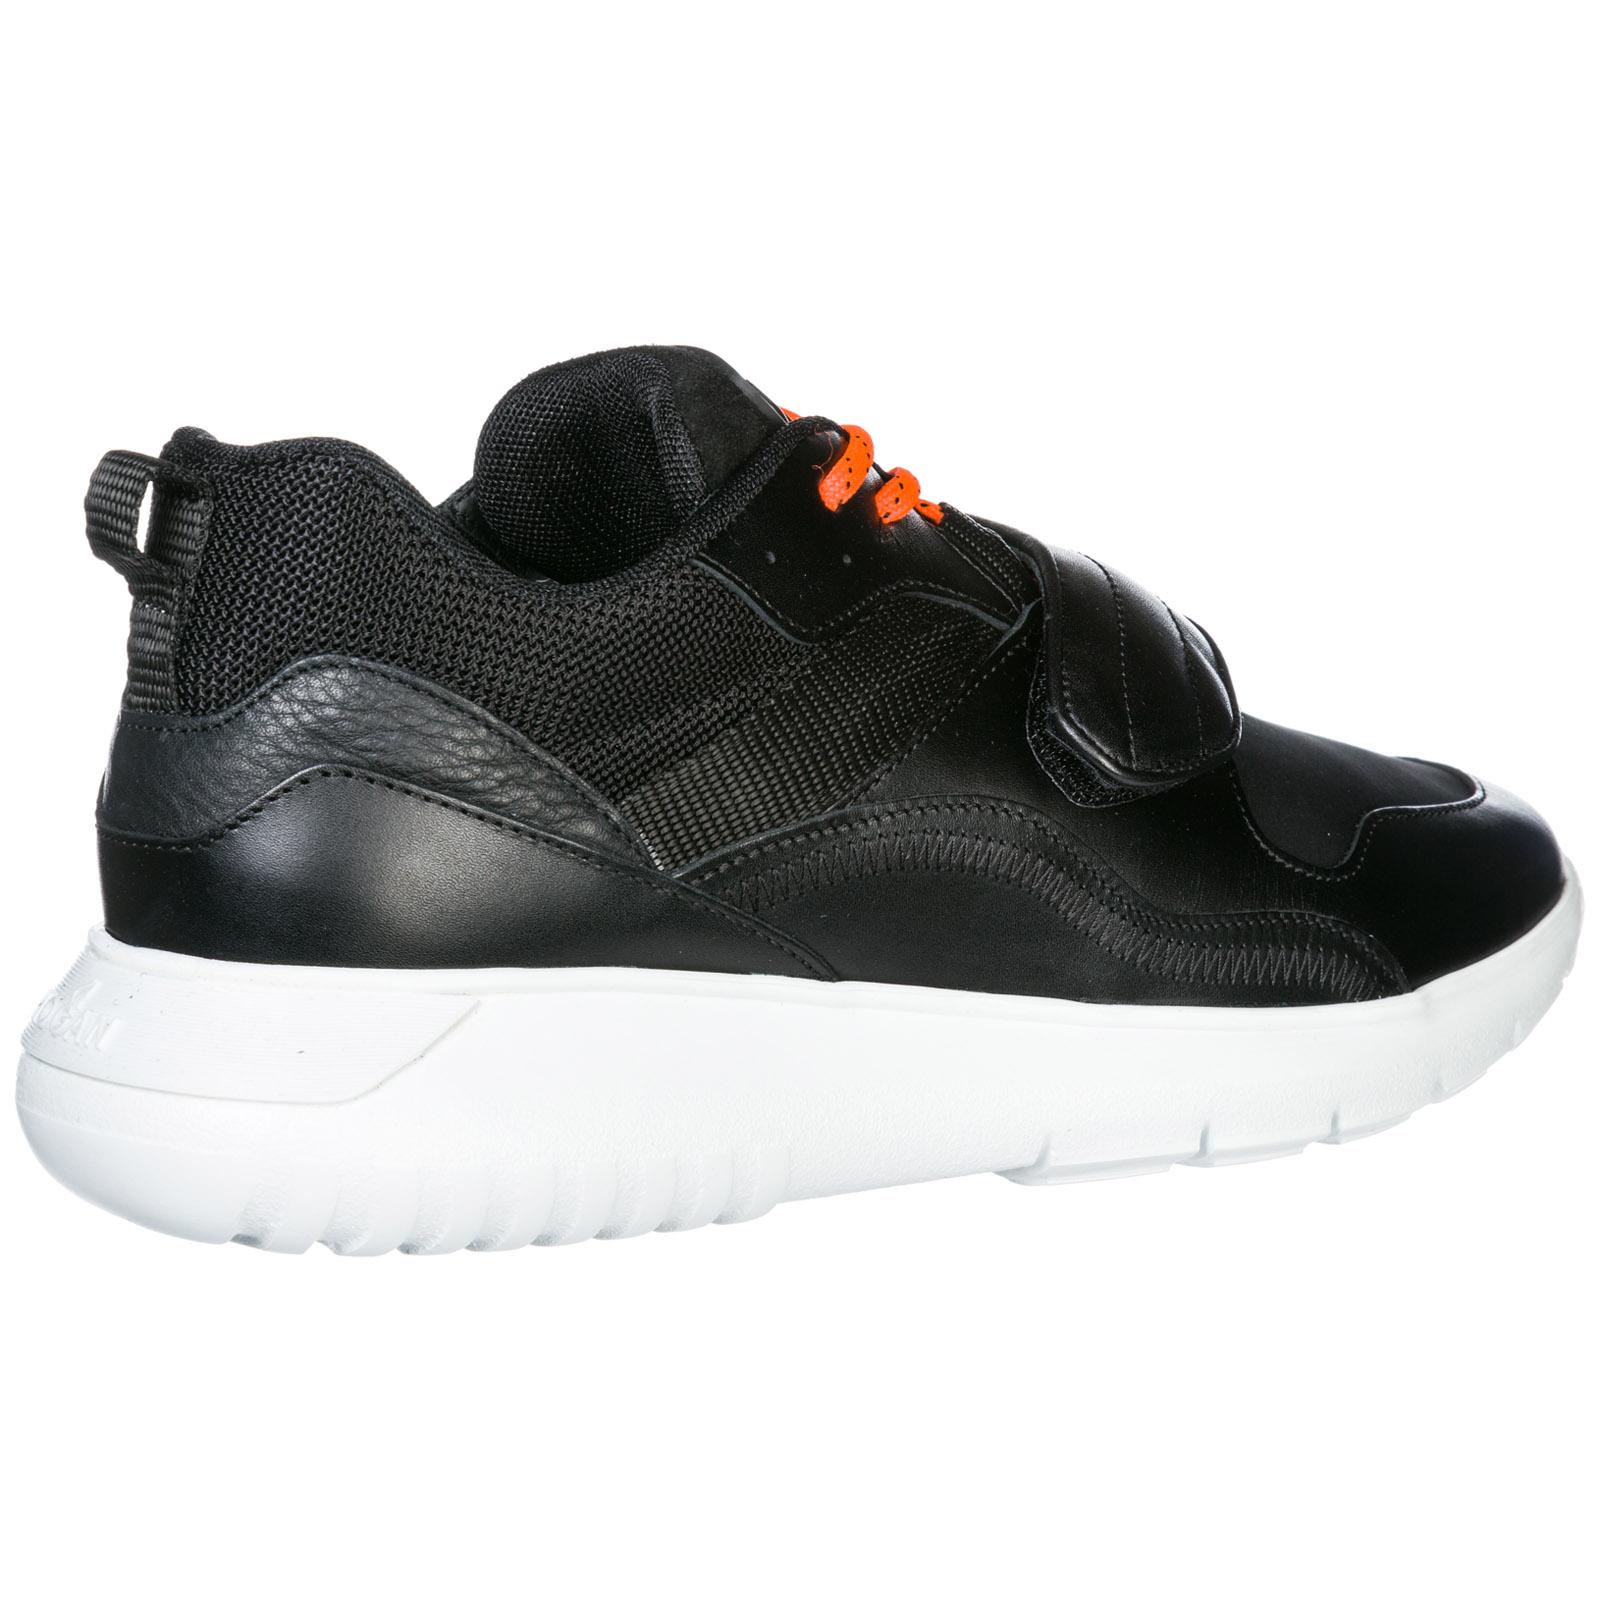 Scarpe sneakers uomo in pelle interactive3 memory foam